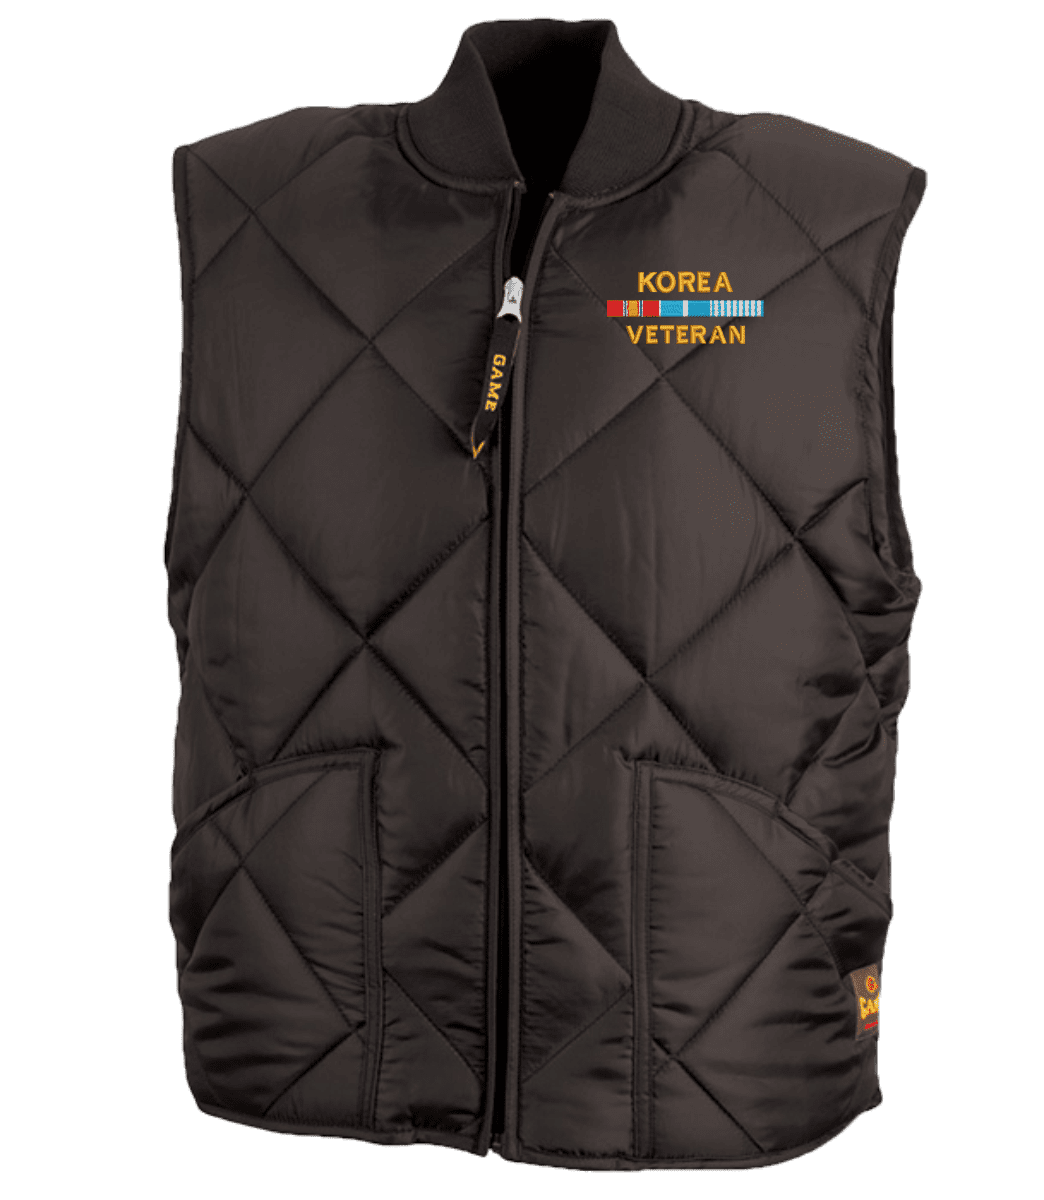 Air Force Korea Veteran Pocket Polo MilitaryBest U.S